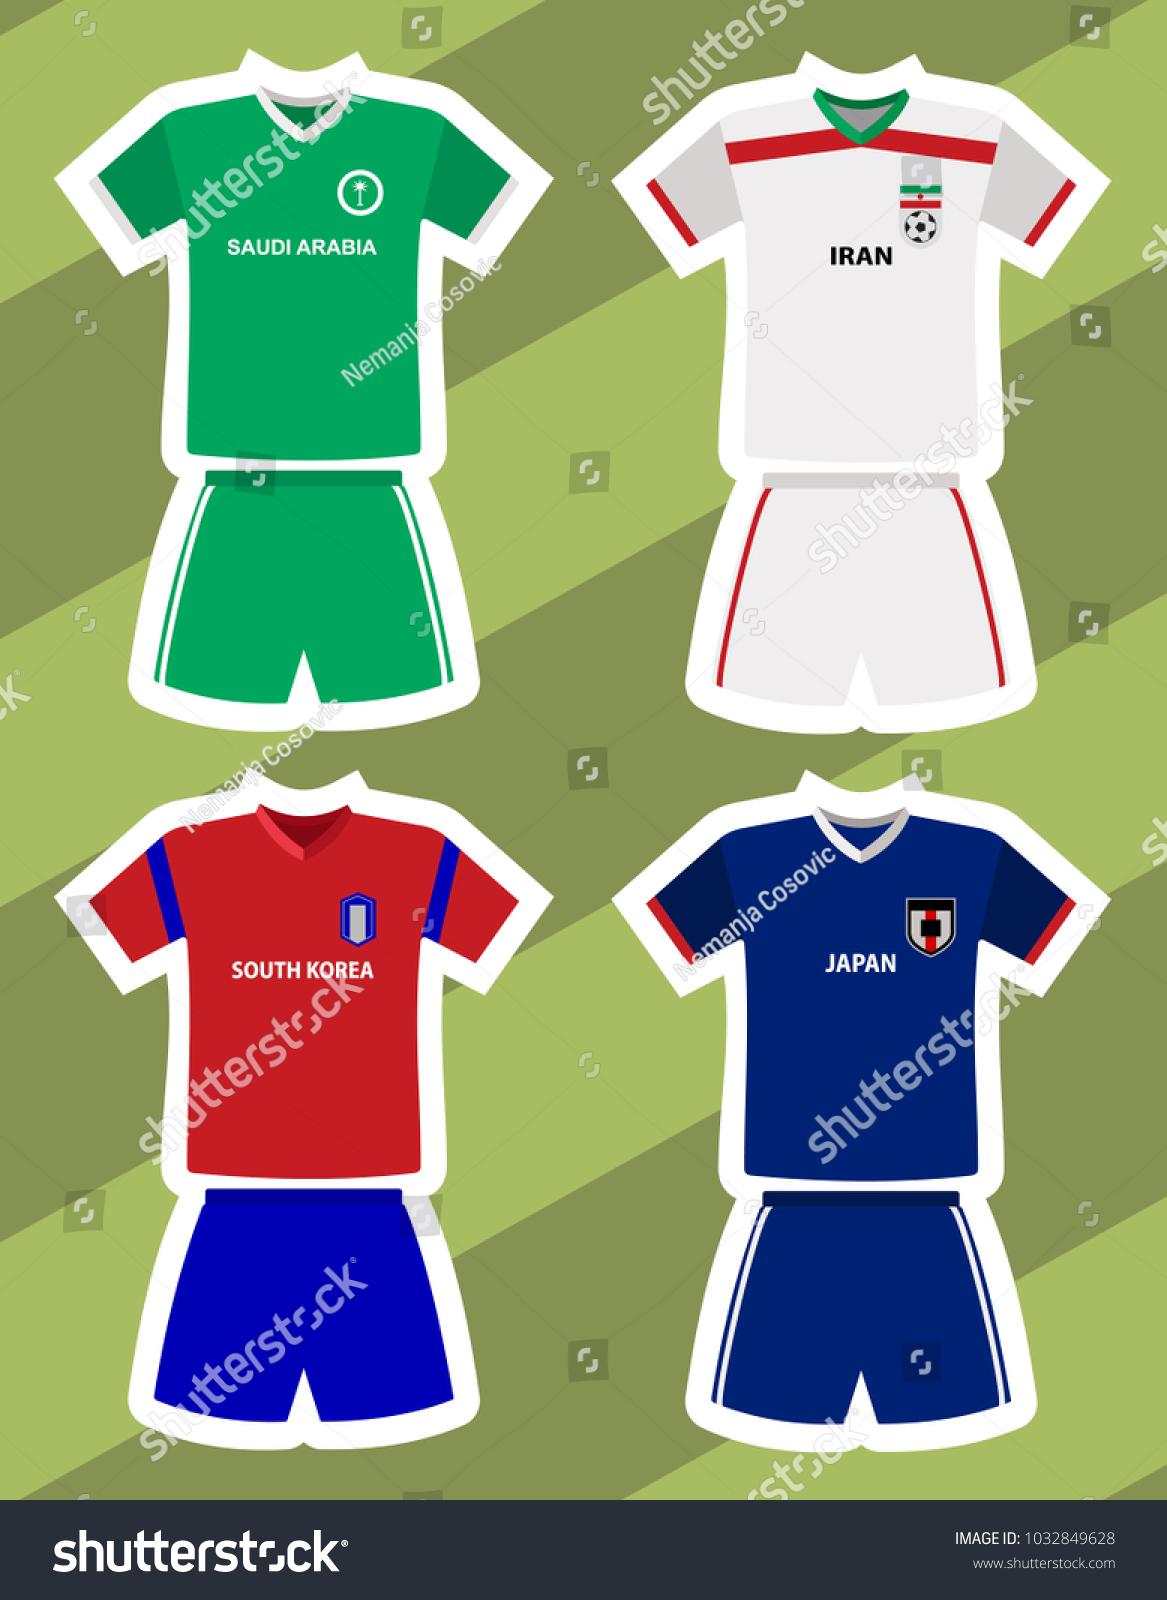 3493f1184 saudi arabia, iran, south korea and japan football or soccer jersey